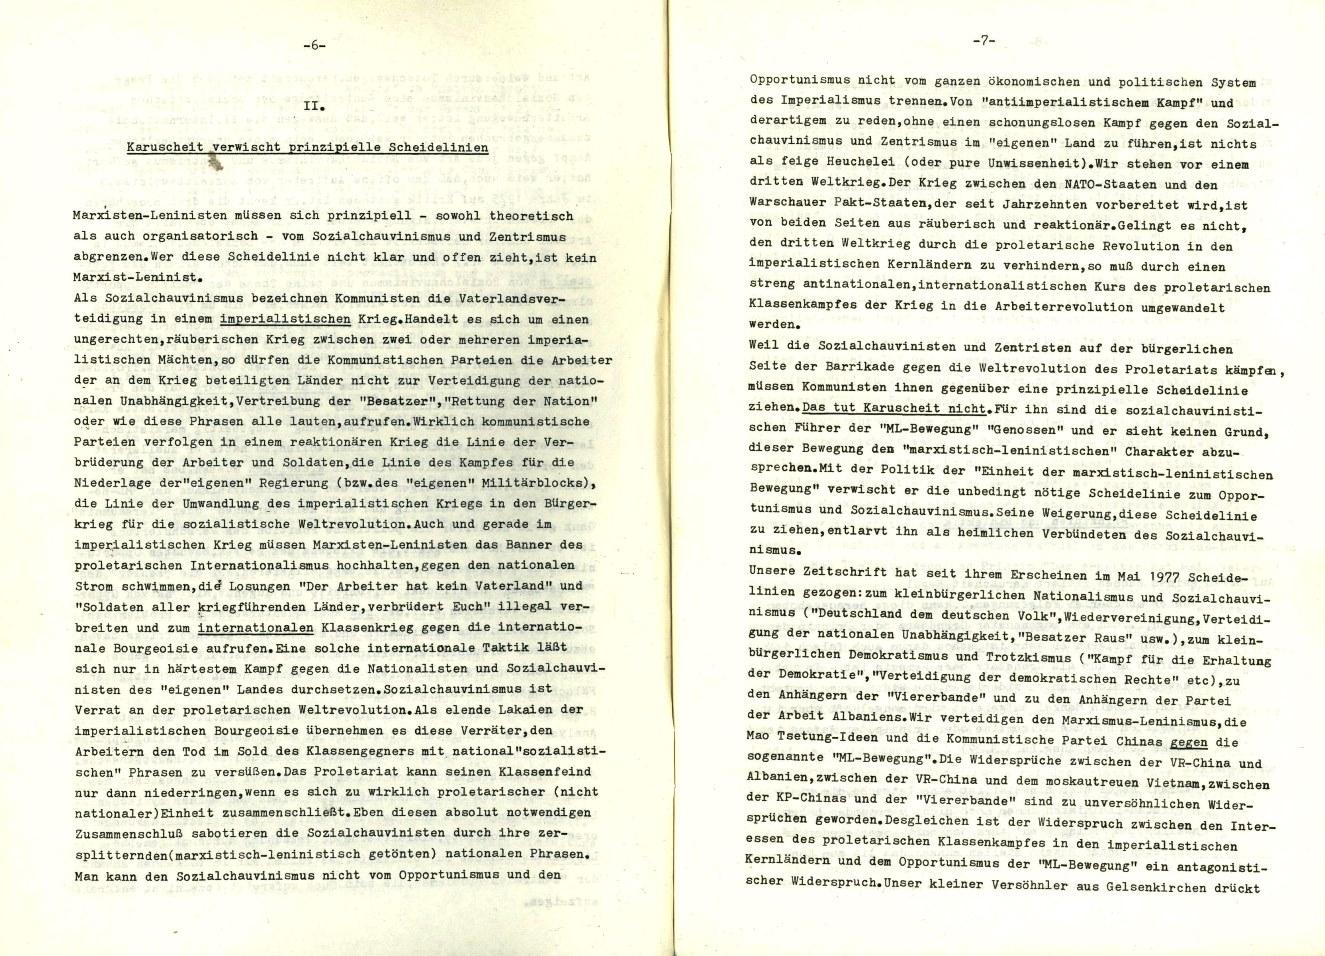 Muenchen_Kampf_dem_Revisionismus_1979_09_04